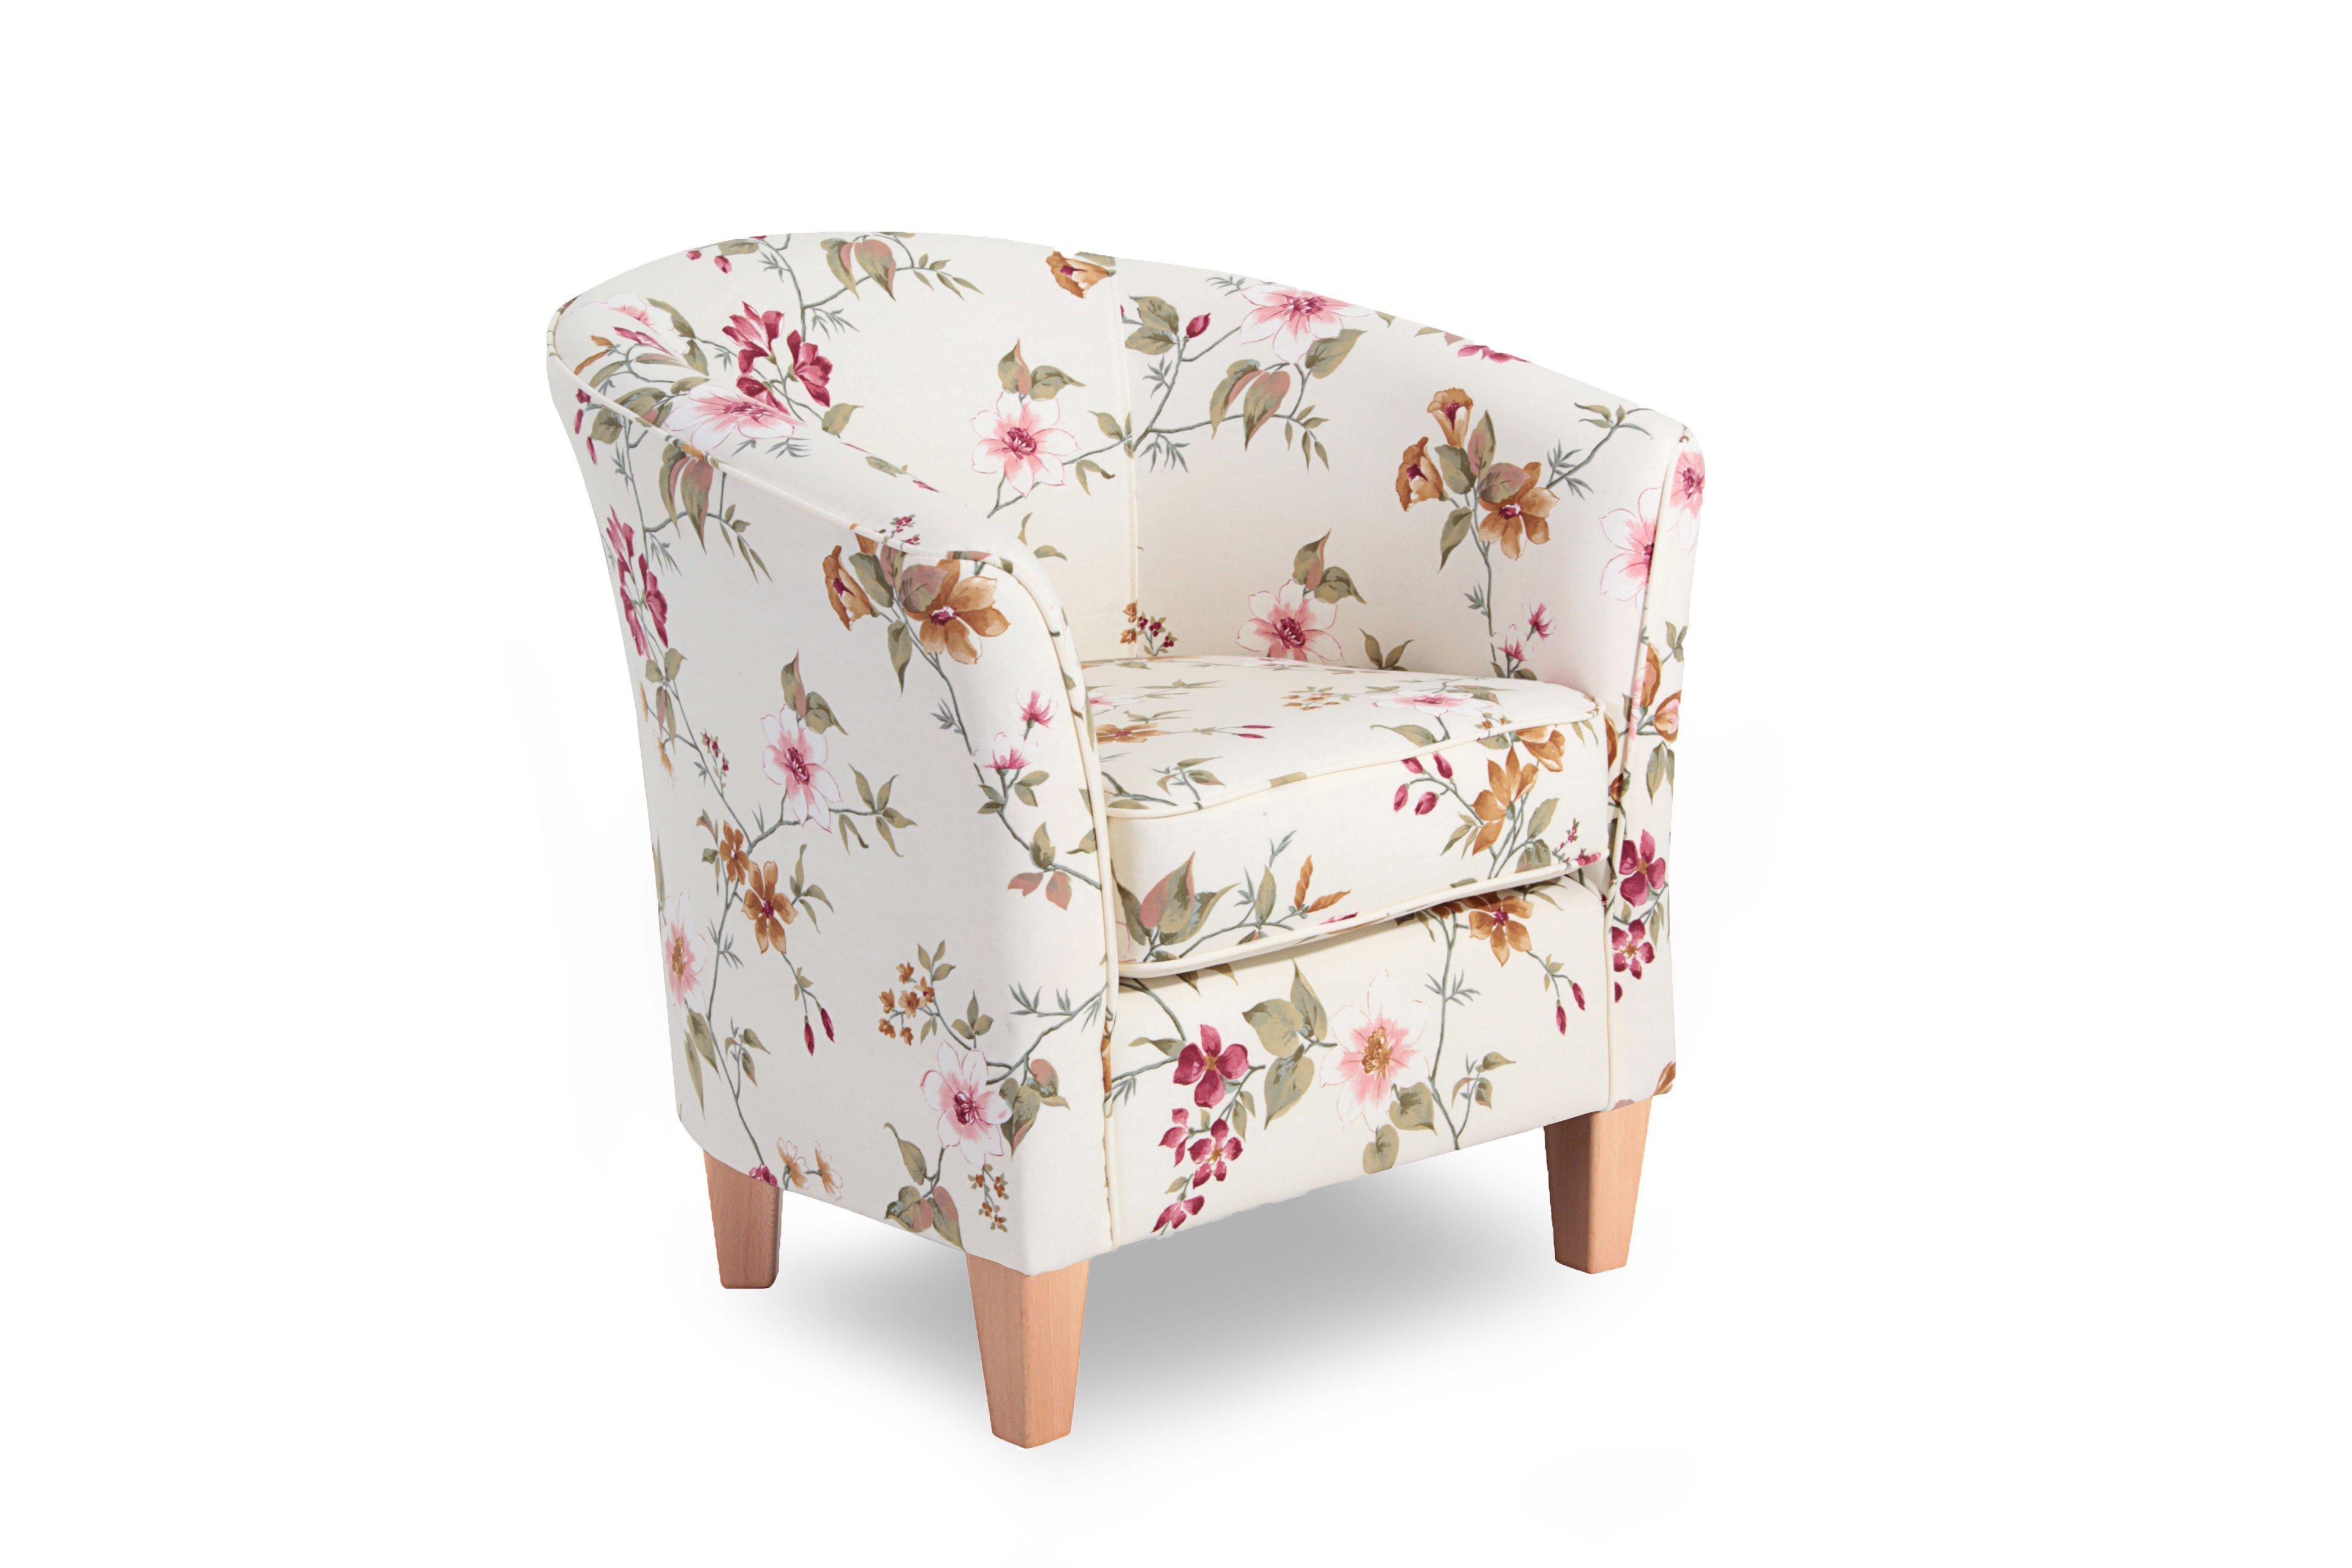 max winzer livia sessel mit blumenmuster m bel letz ihr online shop. Black Bedroom Furniture Sets. Home Design Ideas